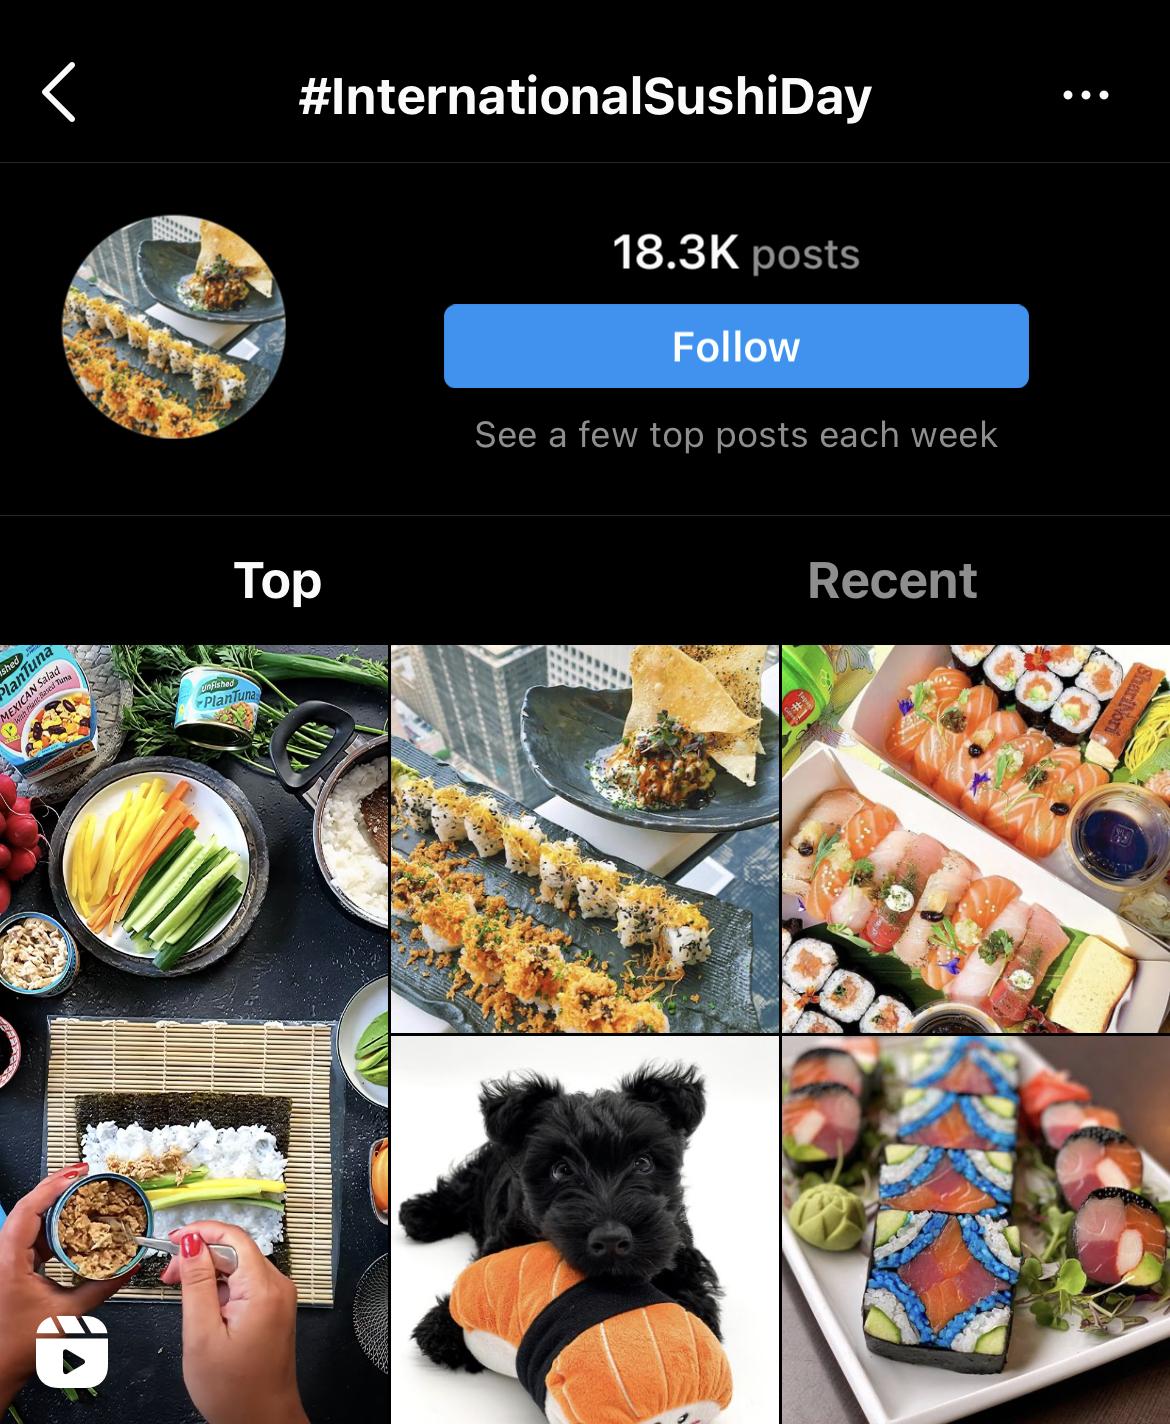 international sushi day results